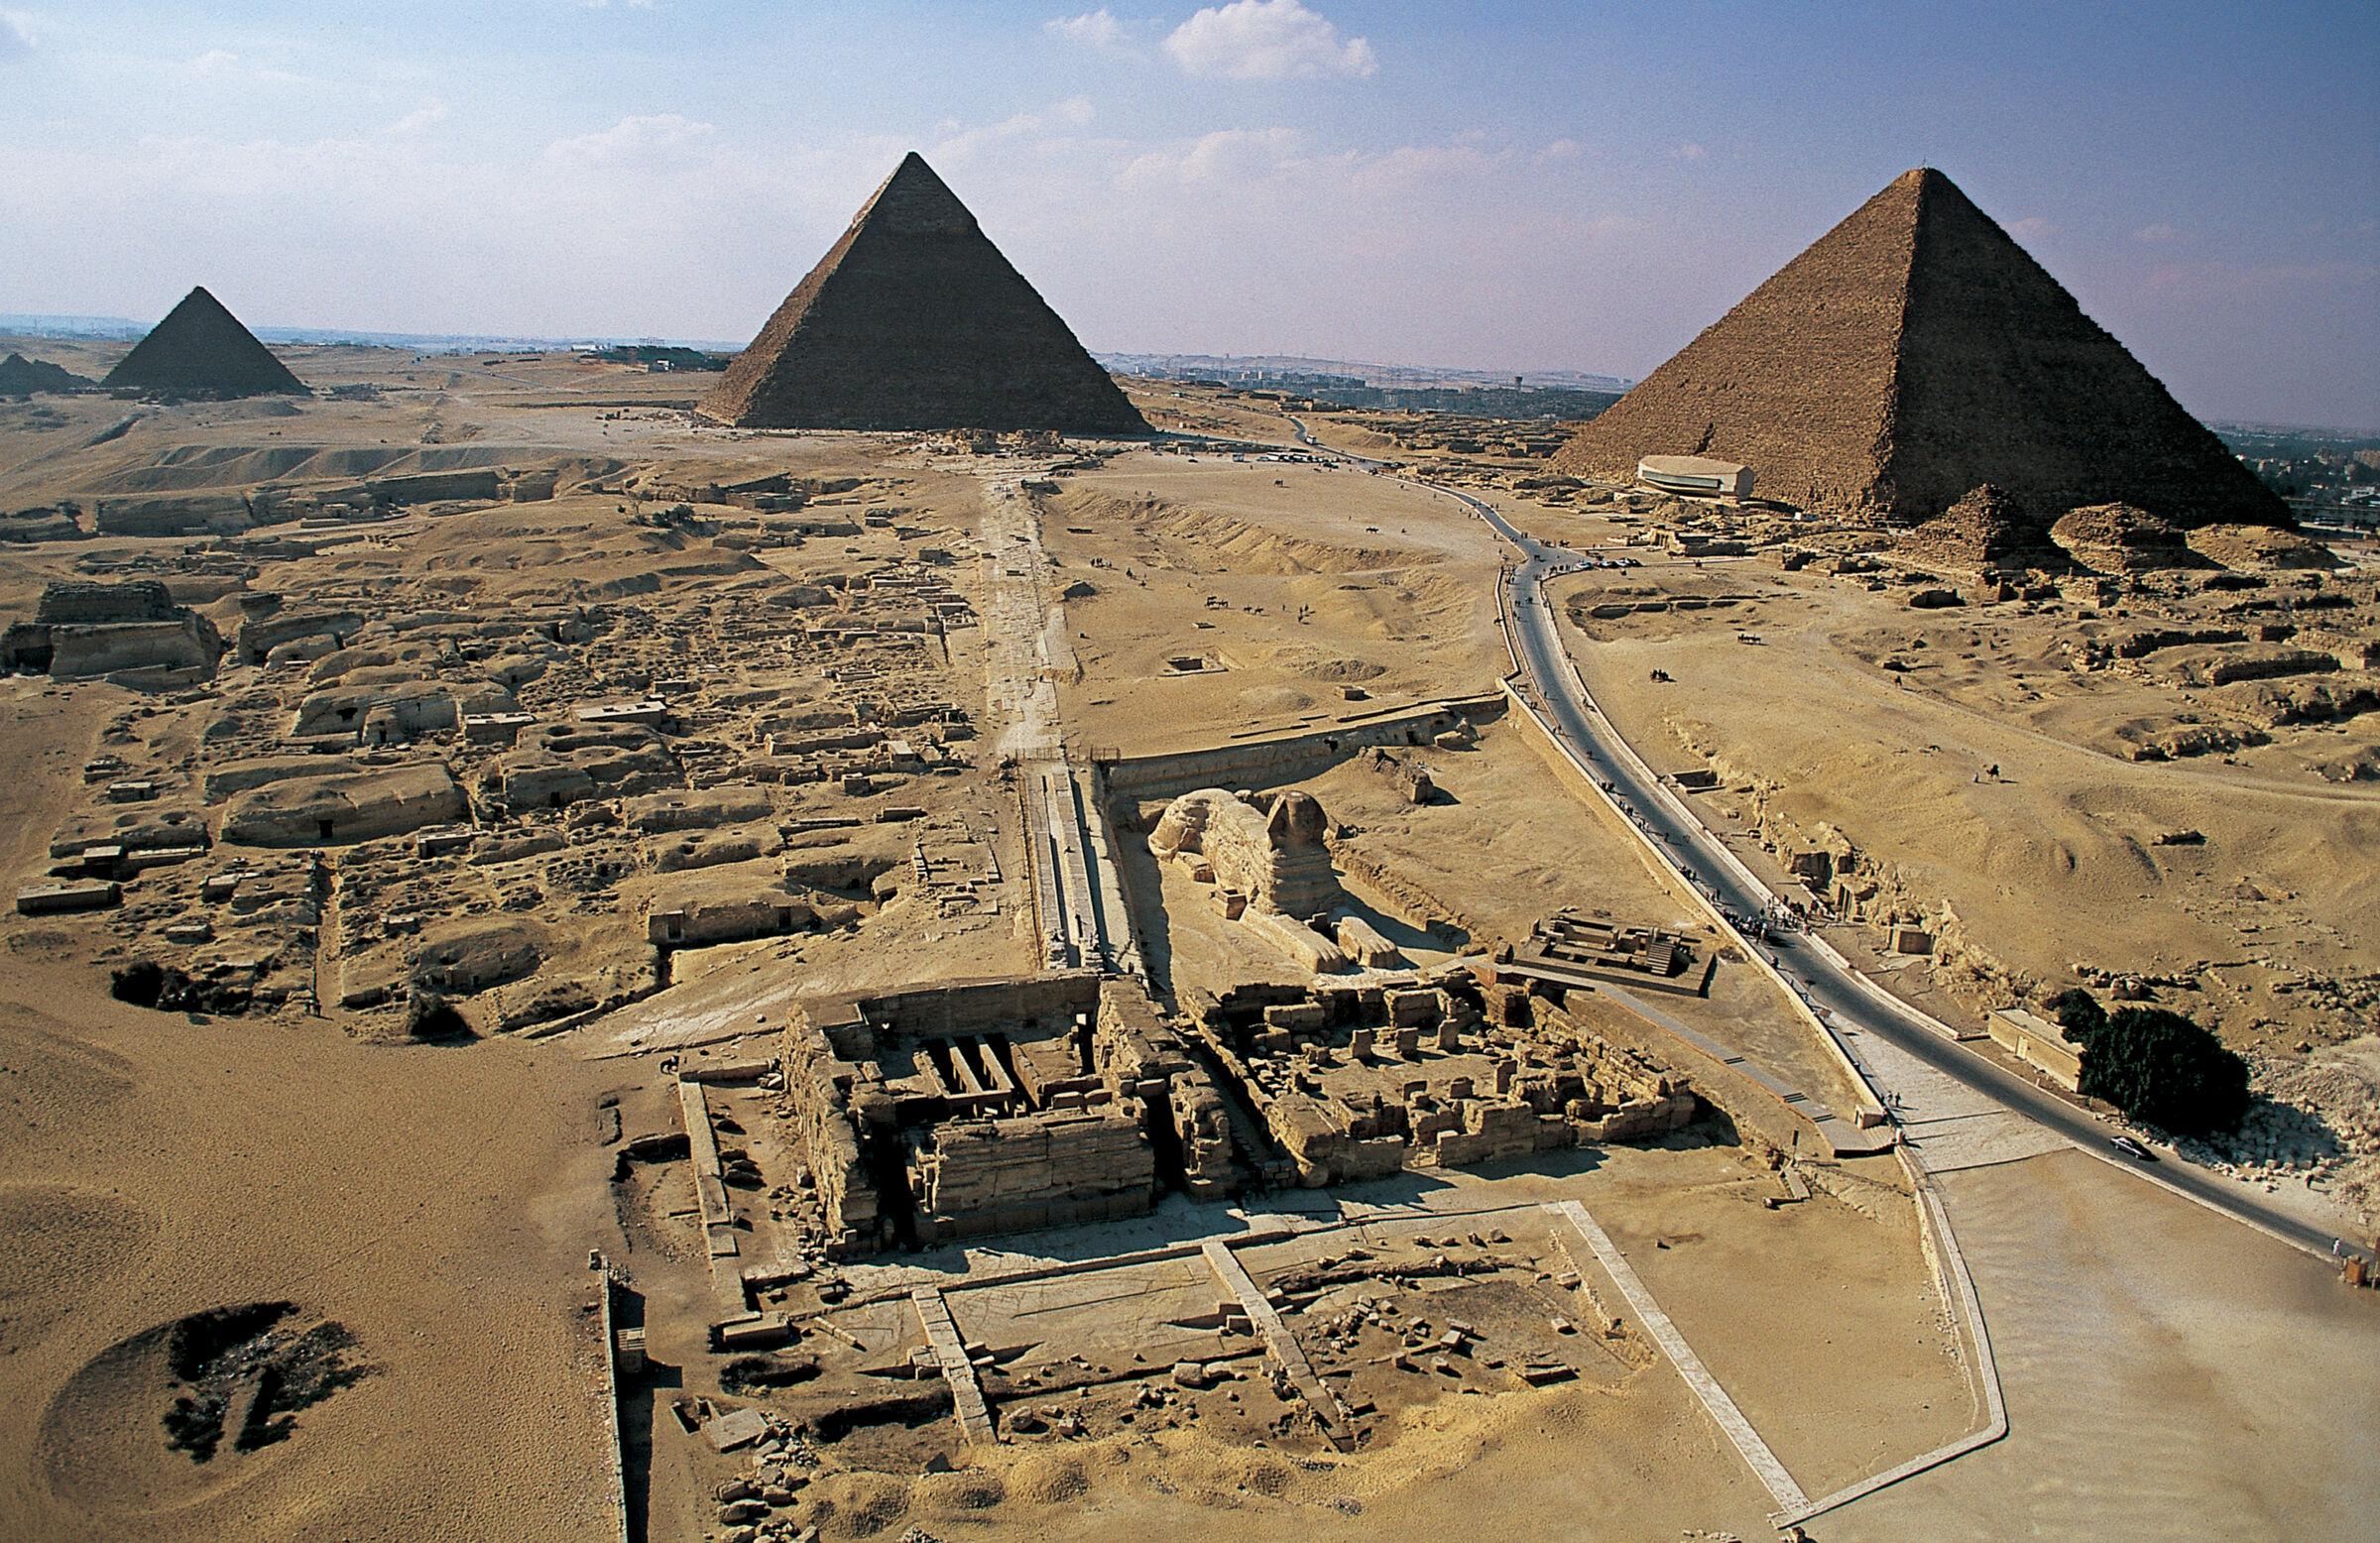 General view: Site: Giza; View: Khufu pyramid, Khafre pyramid, Menkaure pyramid, Sphinx